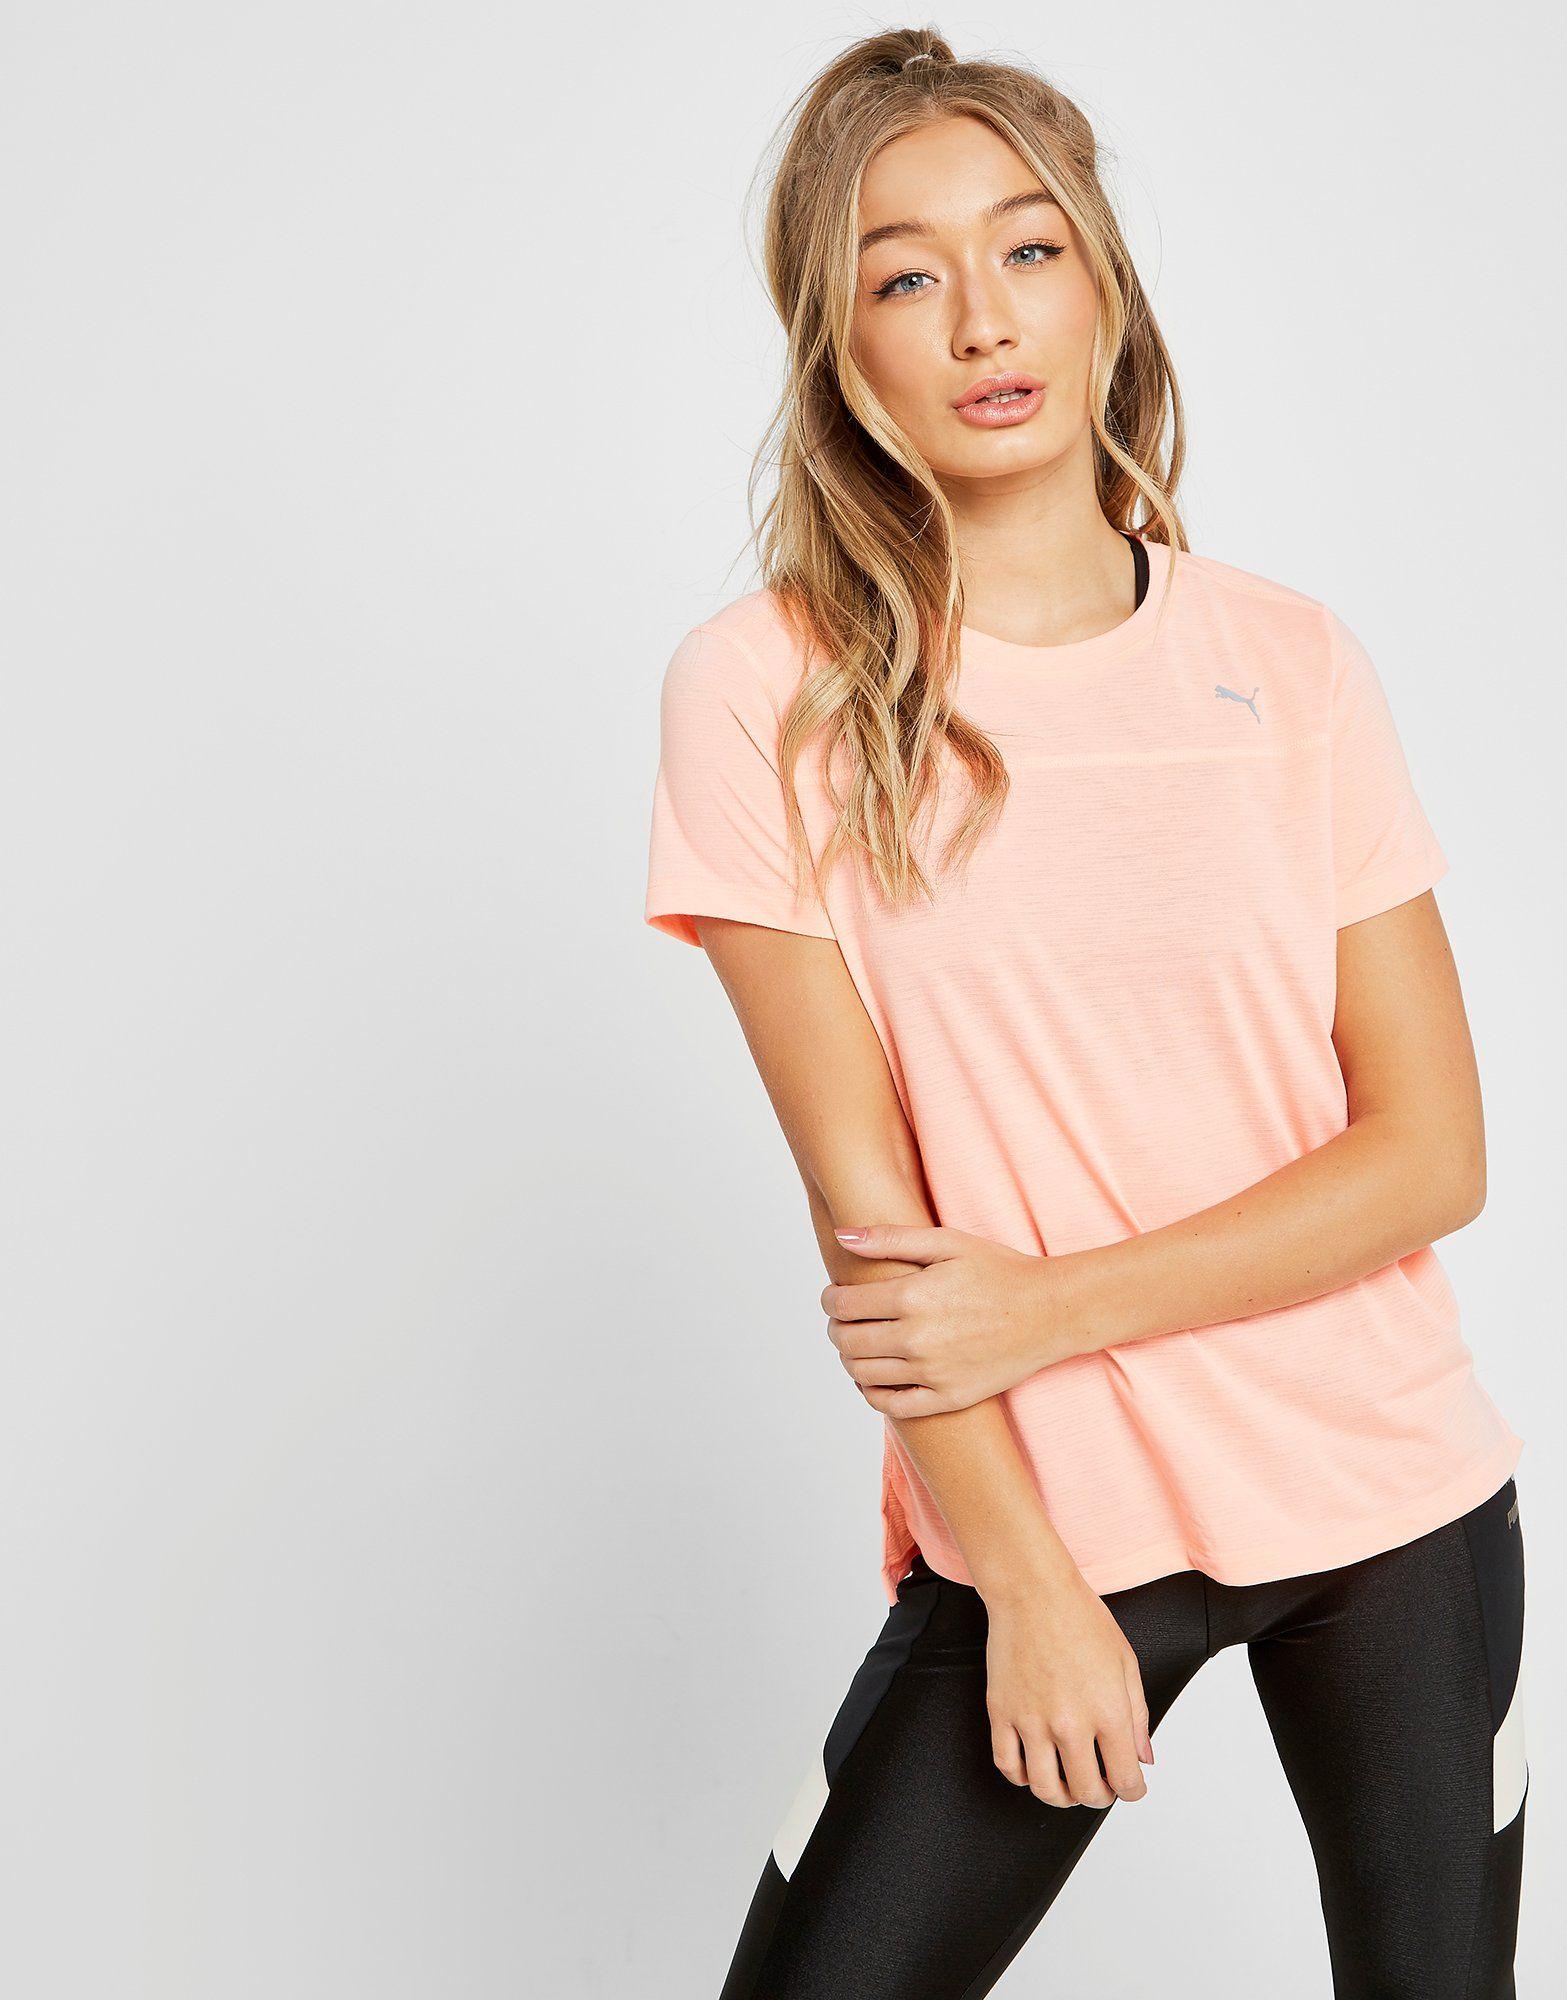 PUMA Running Short Sleeve T-Shirt